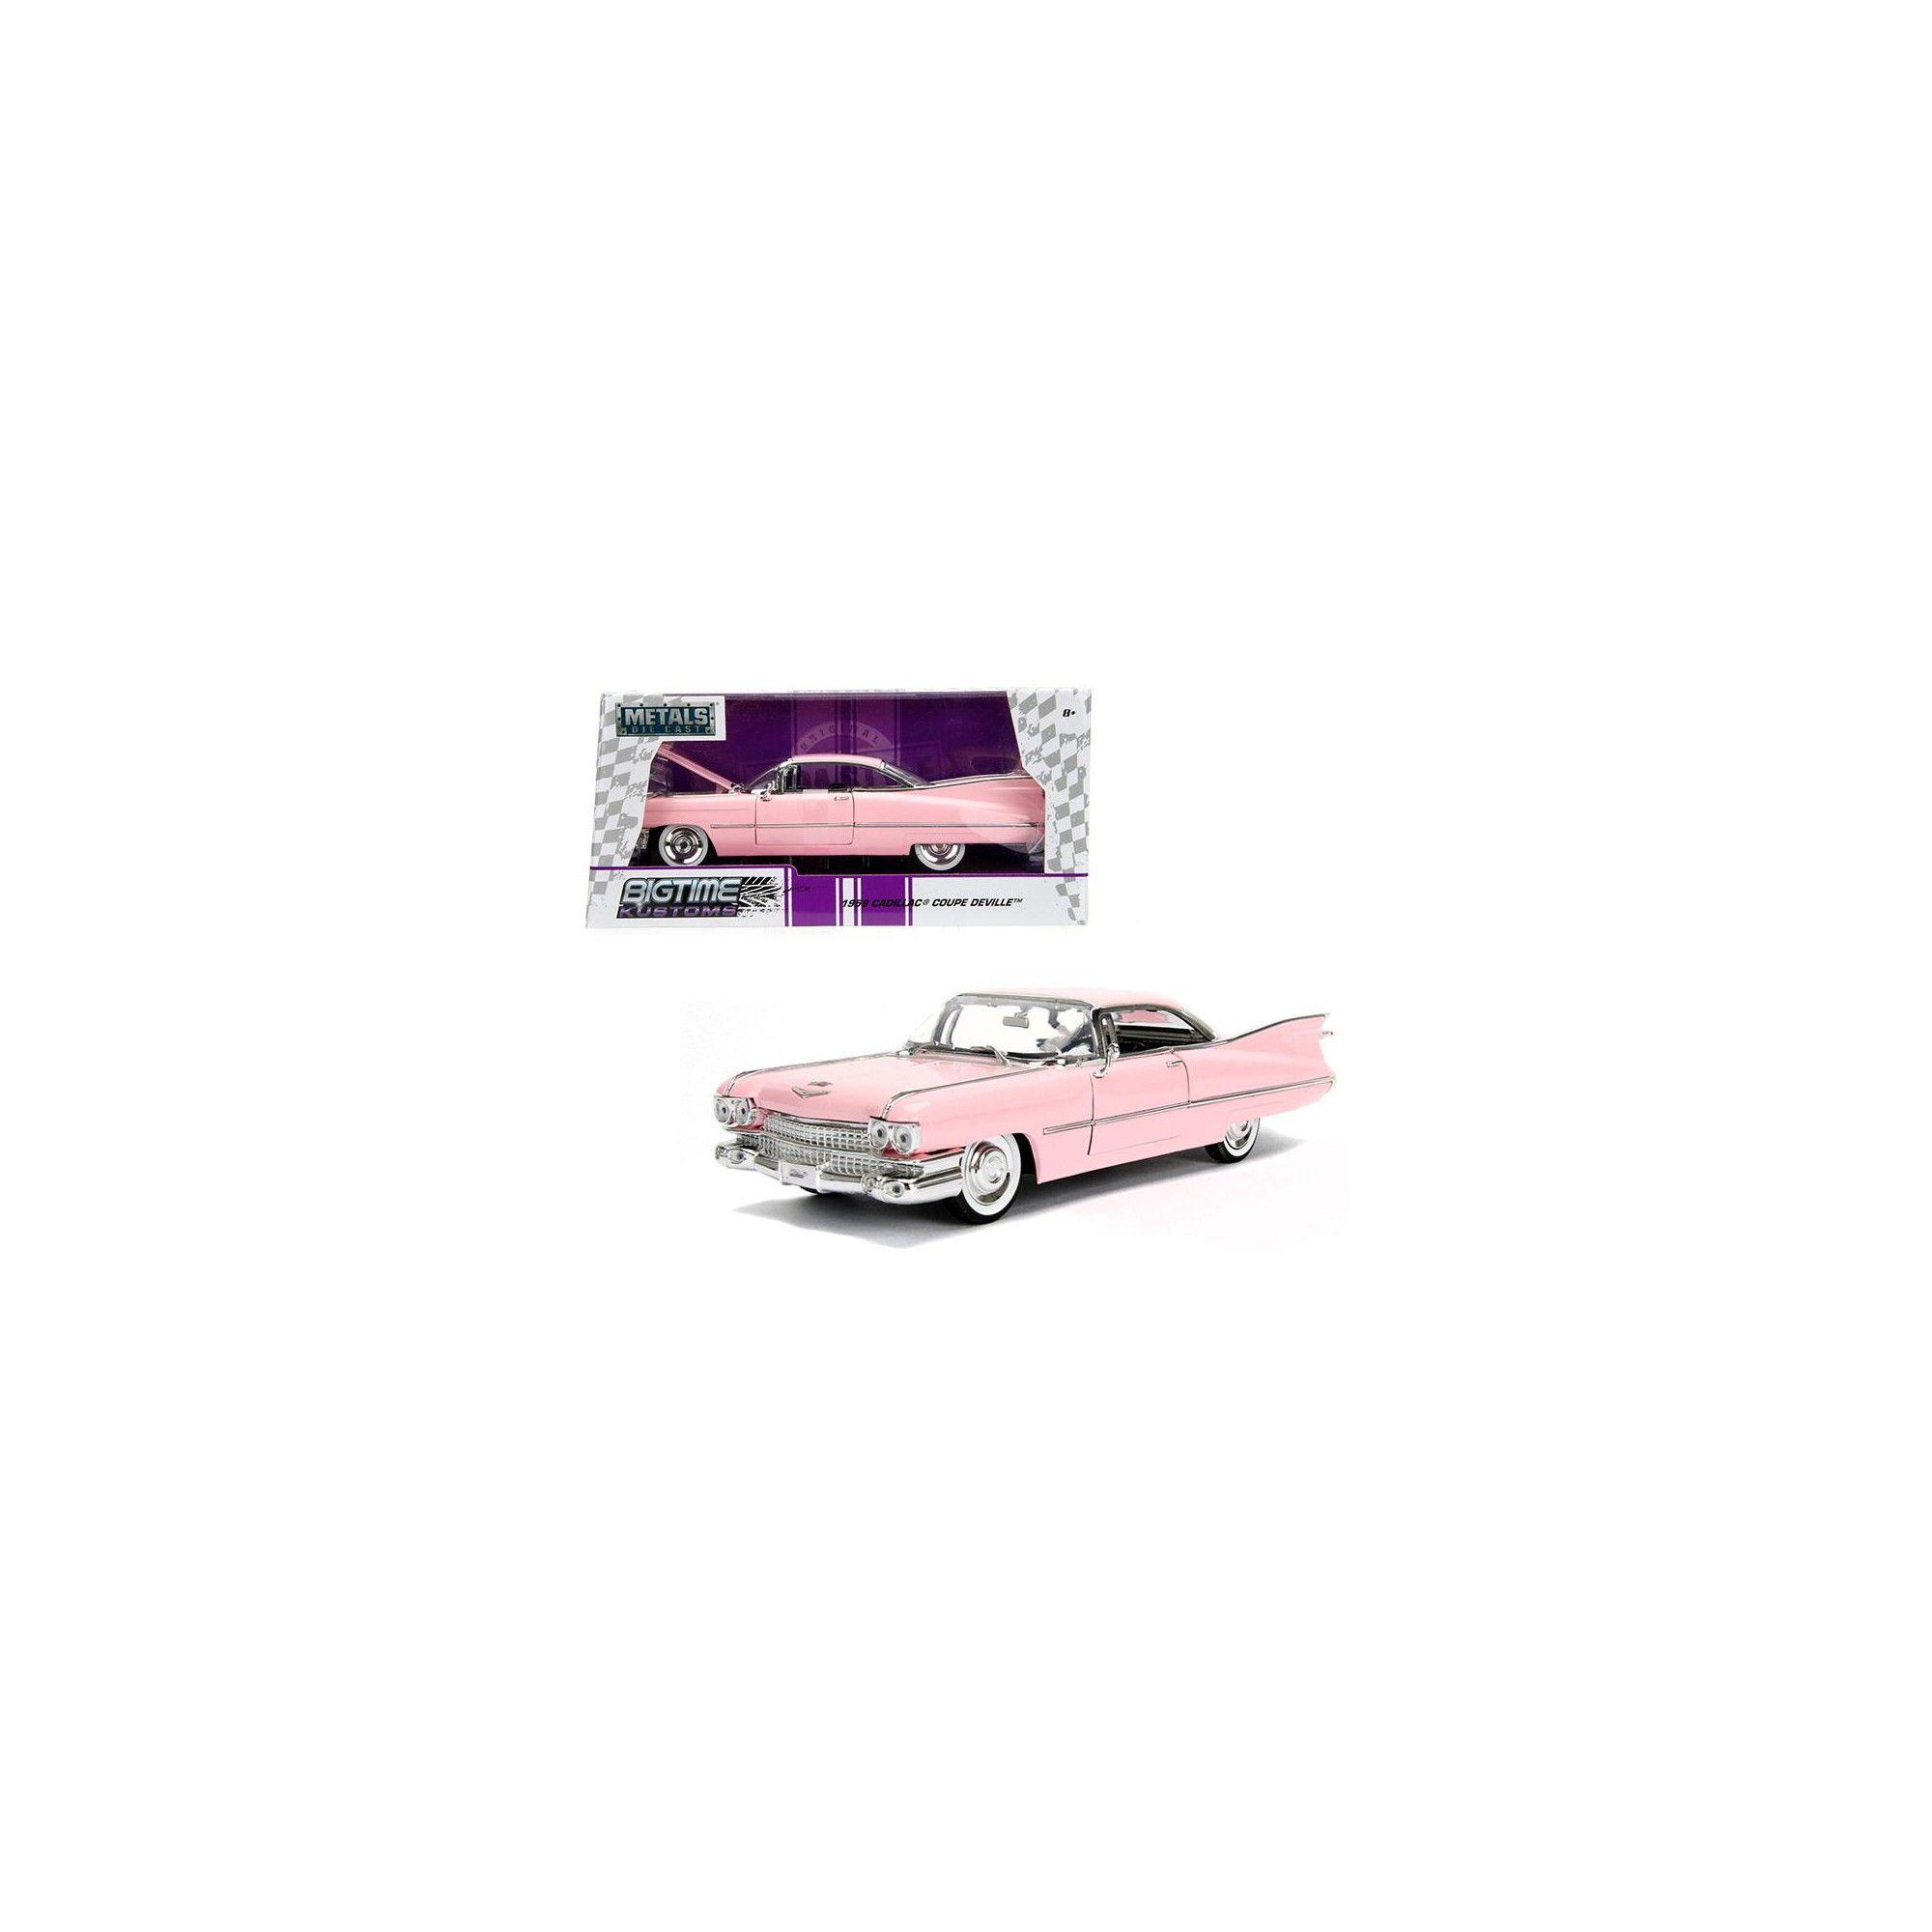 3 bett halb badezimmer ideen  cadillac coupe deville pink  diecast model car by jada